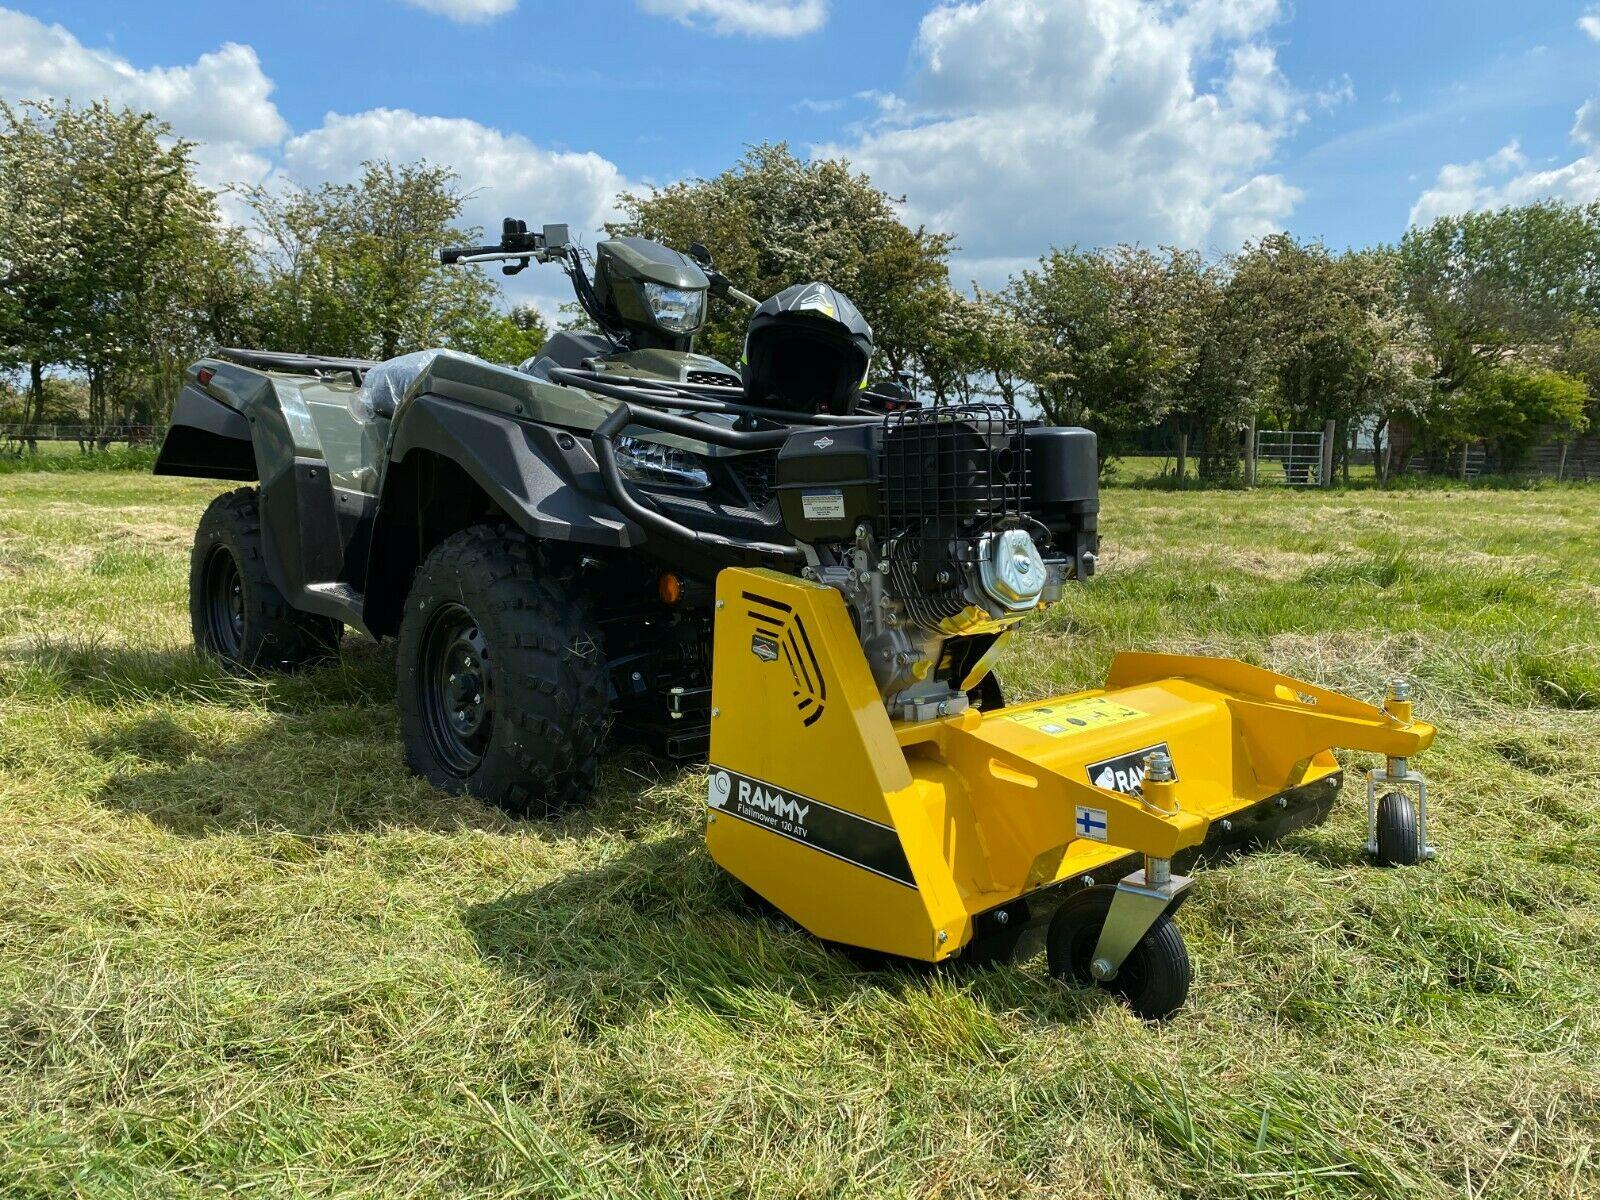 NEW-RAMMY-front-mounted-ATV-quad-bike-_57